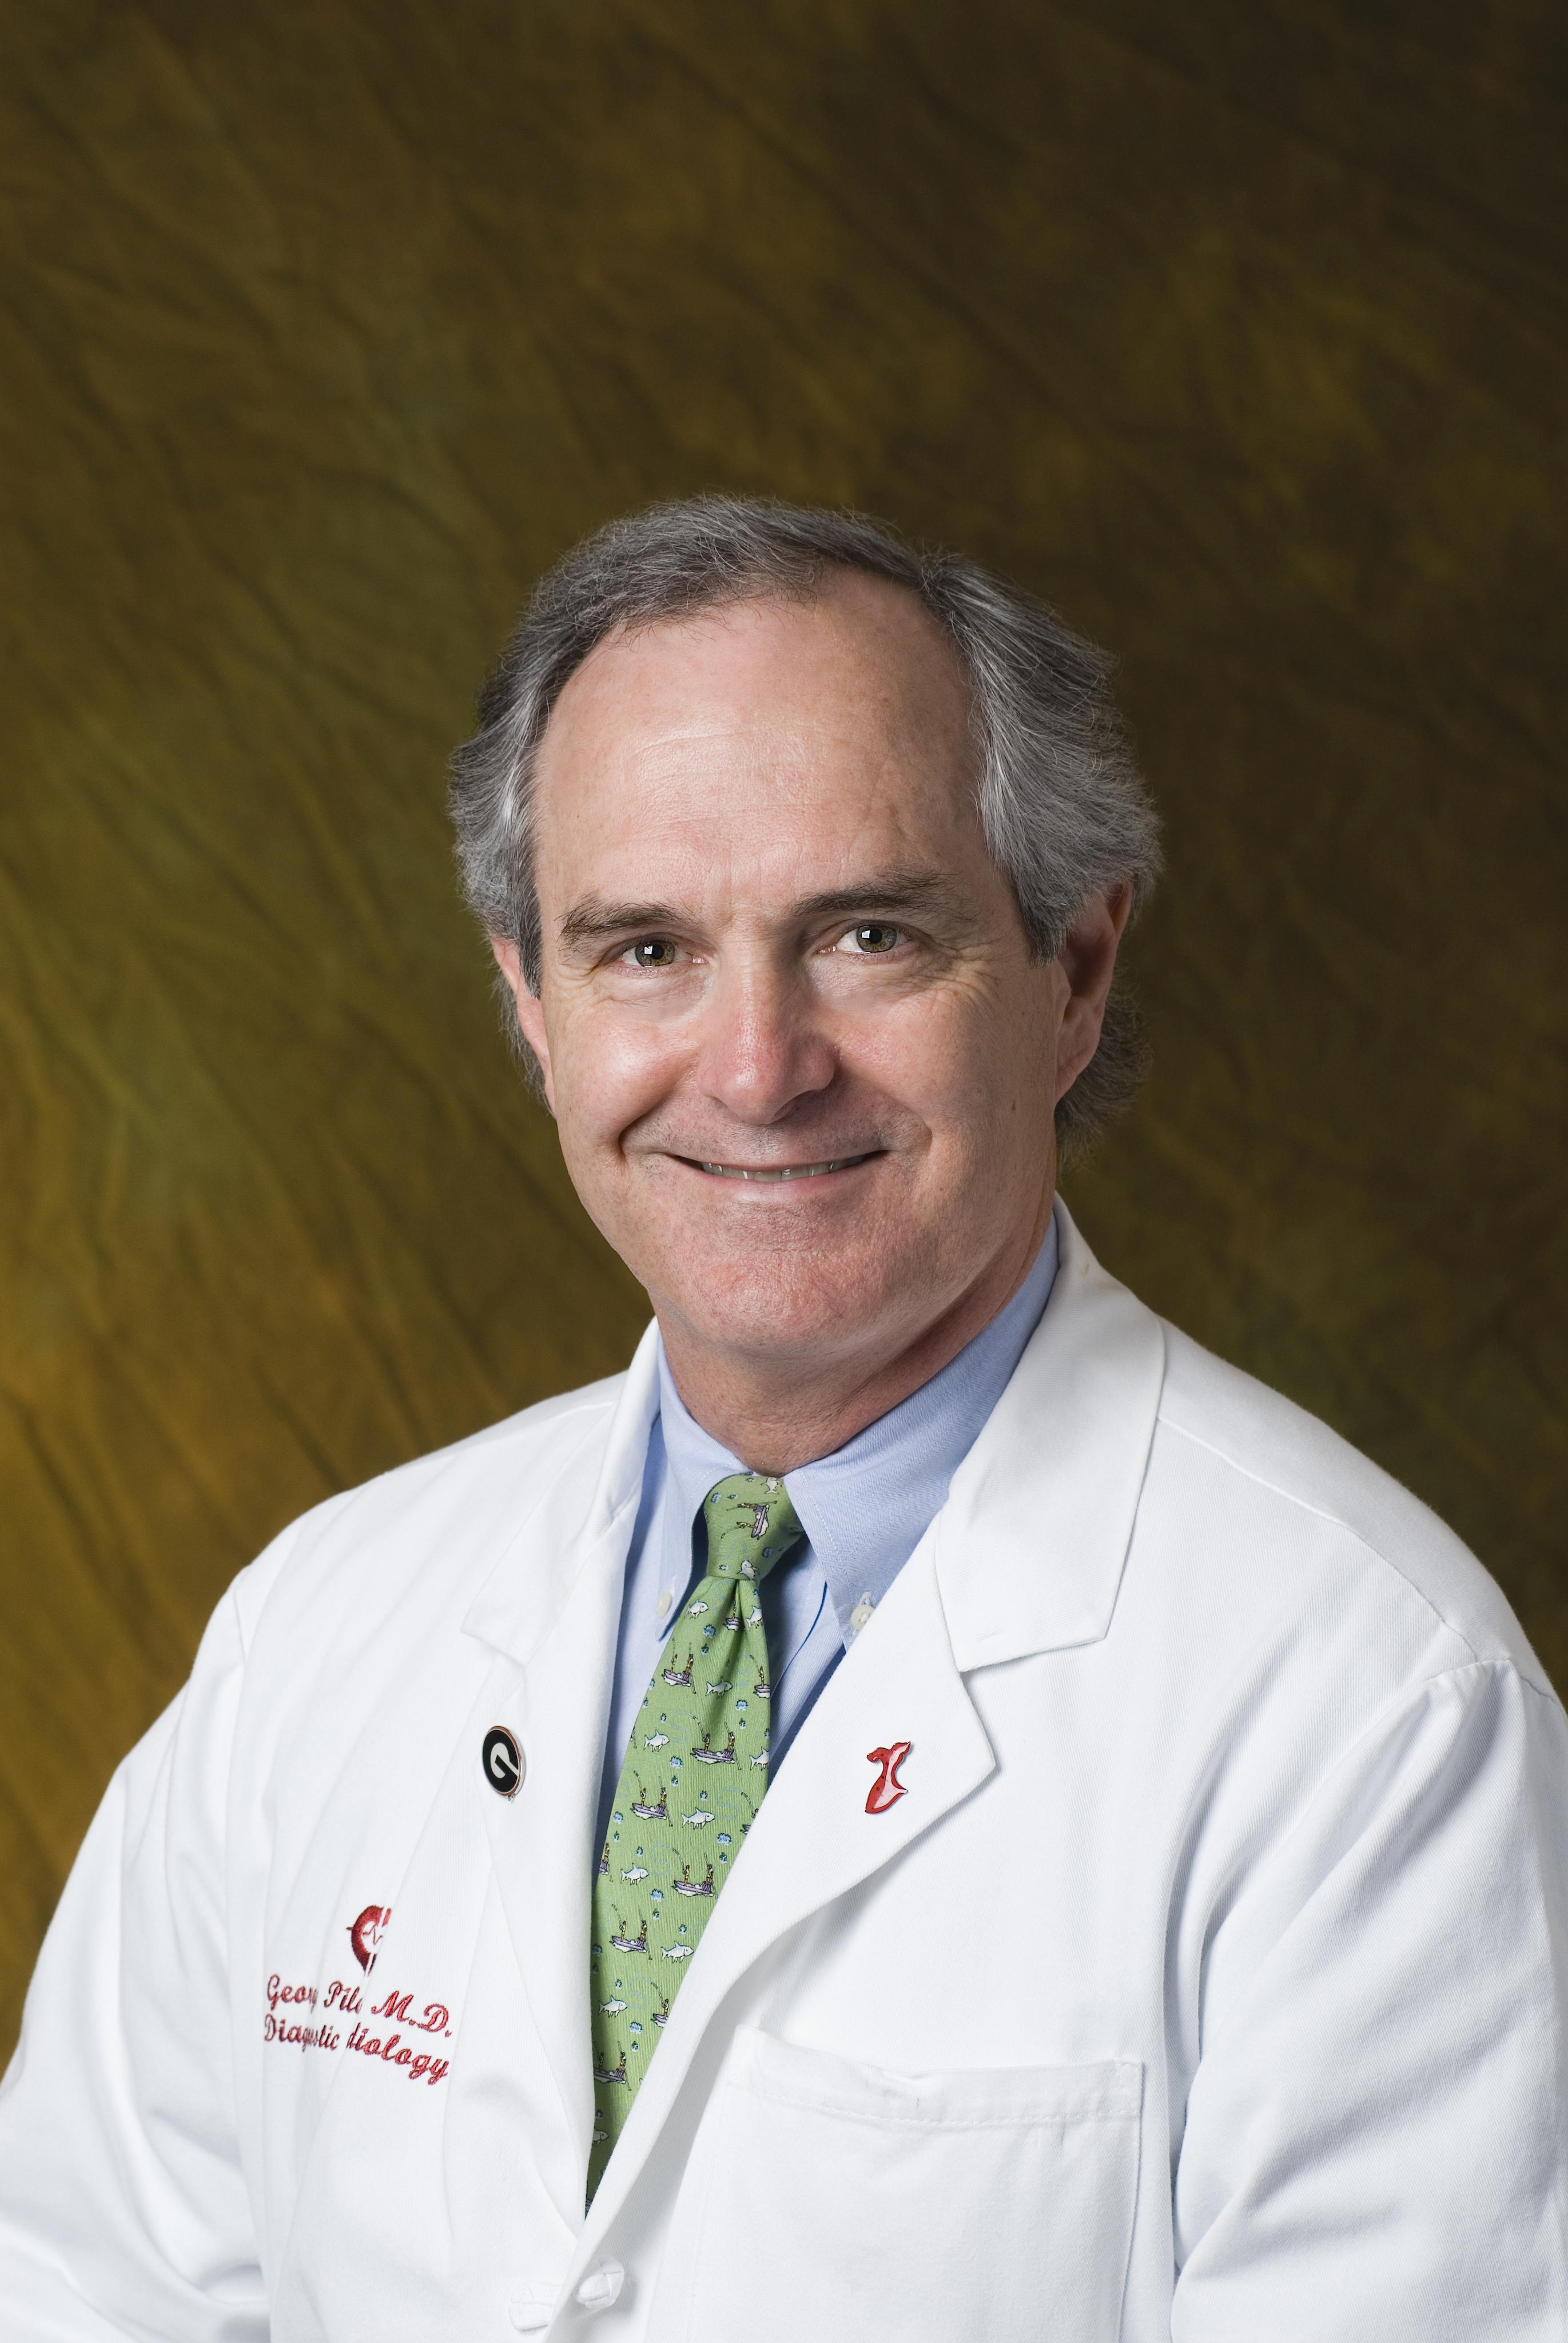 George Pilcher, MD